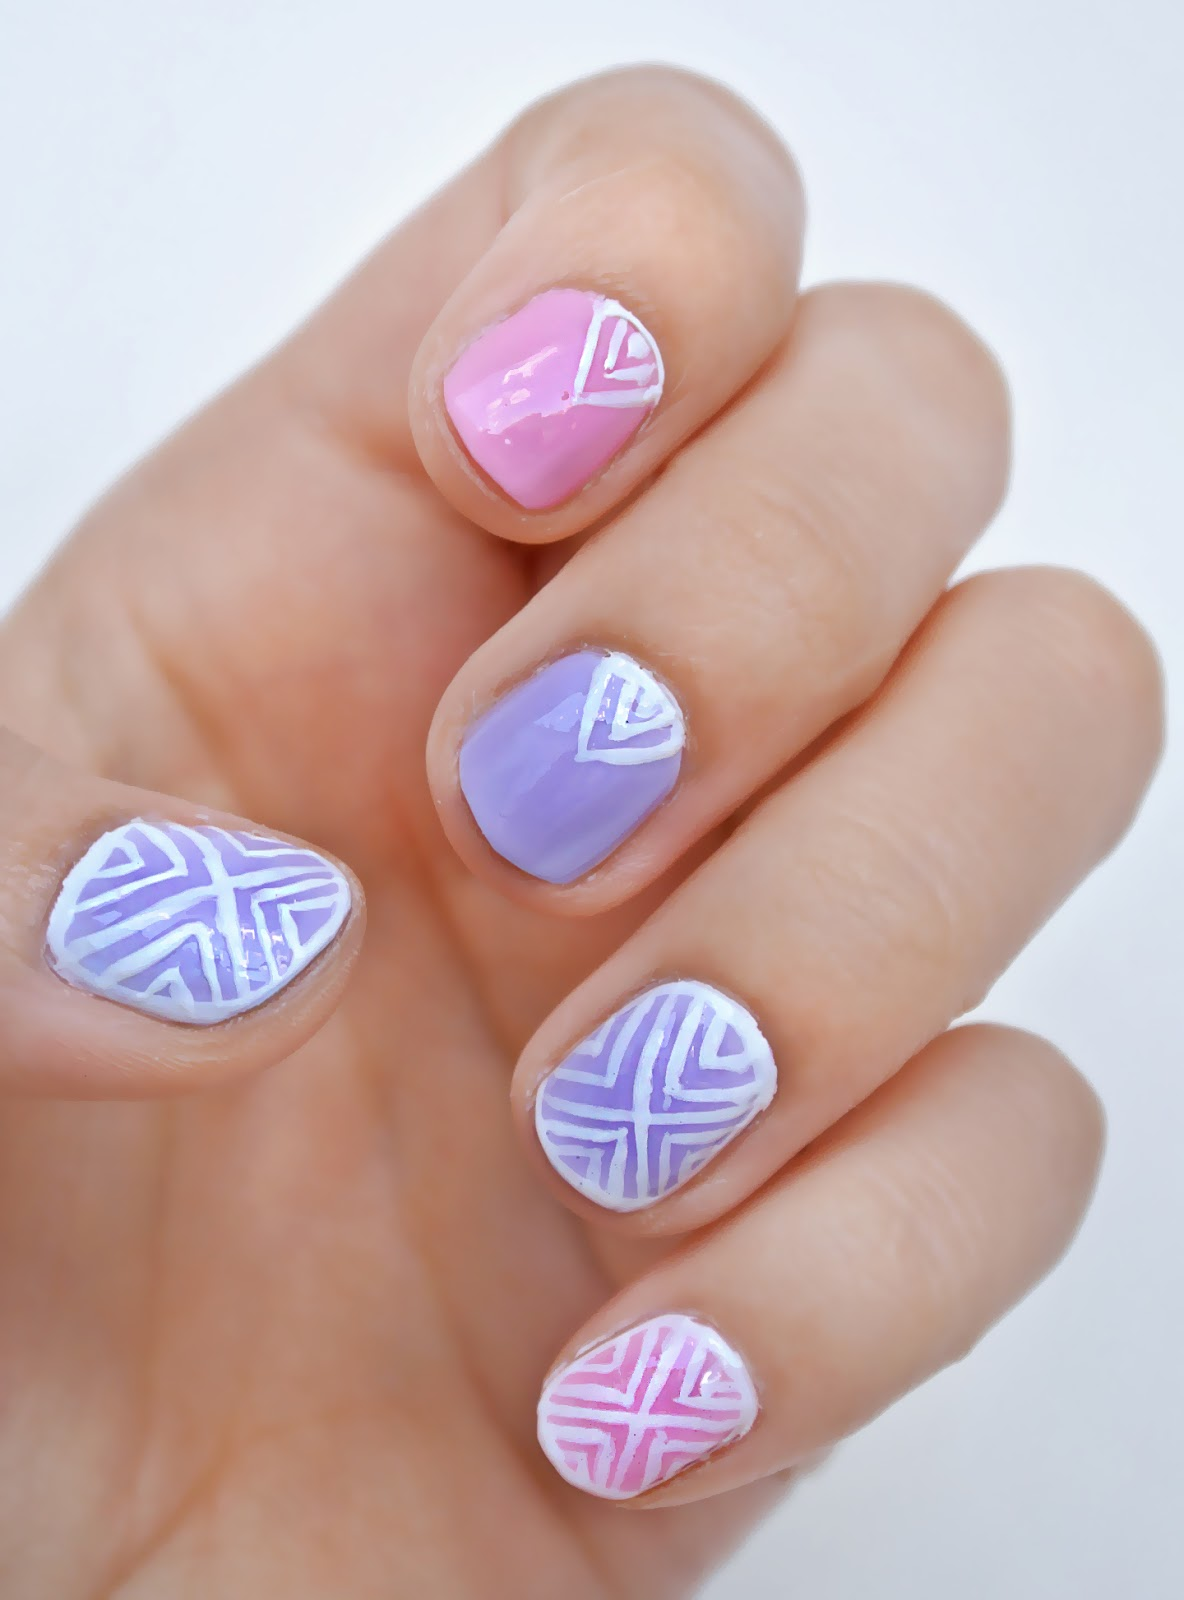 Simple Nail Art Line Designs | Joy Studio Design Gallery ...